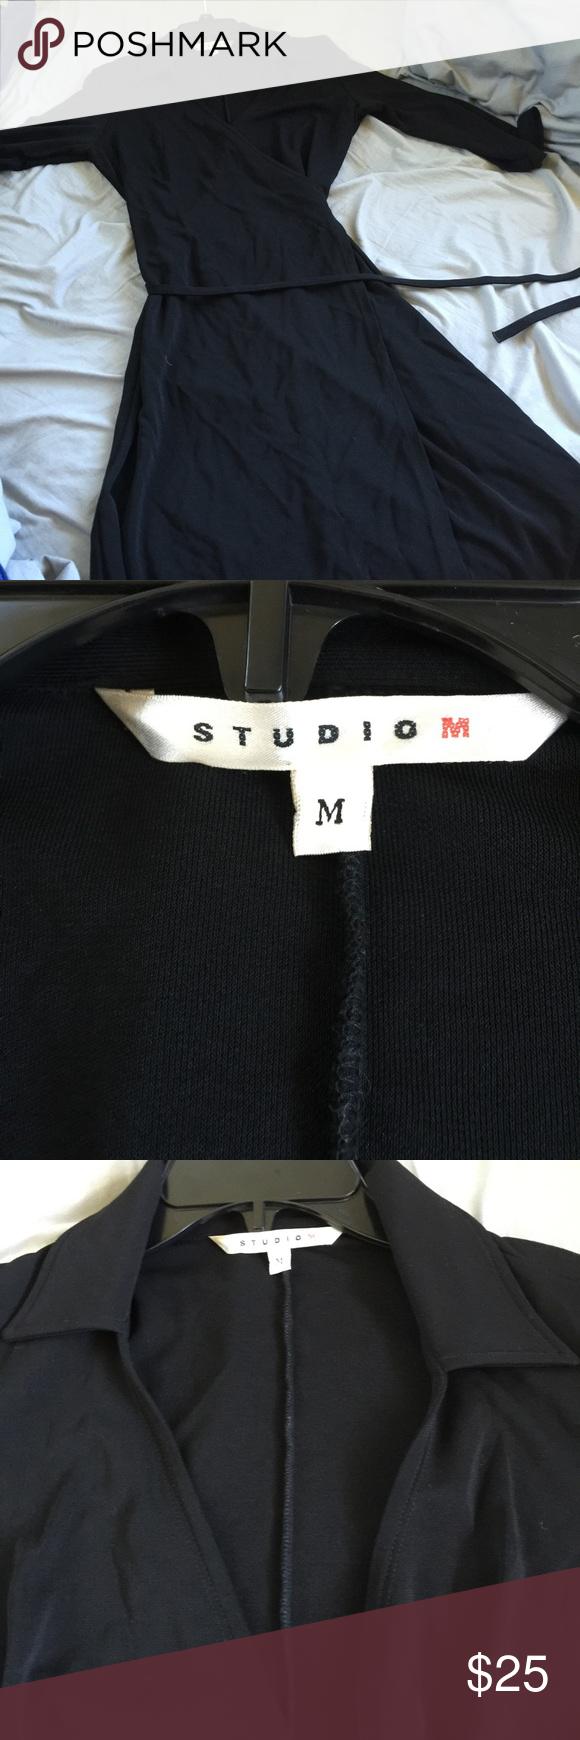 Studio M wrap dress. Size M black Studio M wrap dress. Real wrap dress nothing faux here. Black. Size M Studio M Dresses Midi